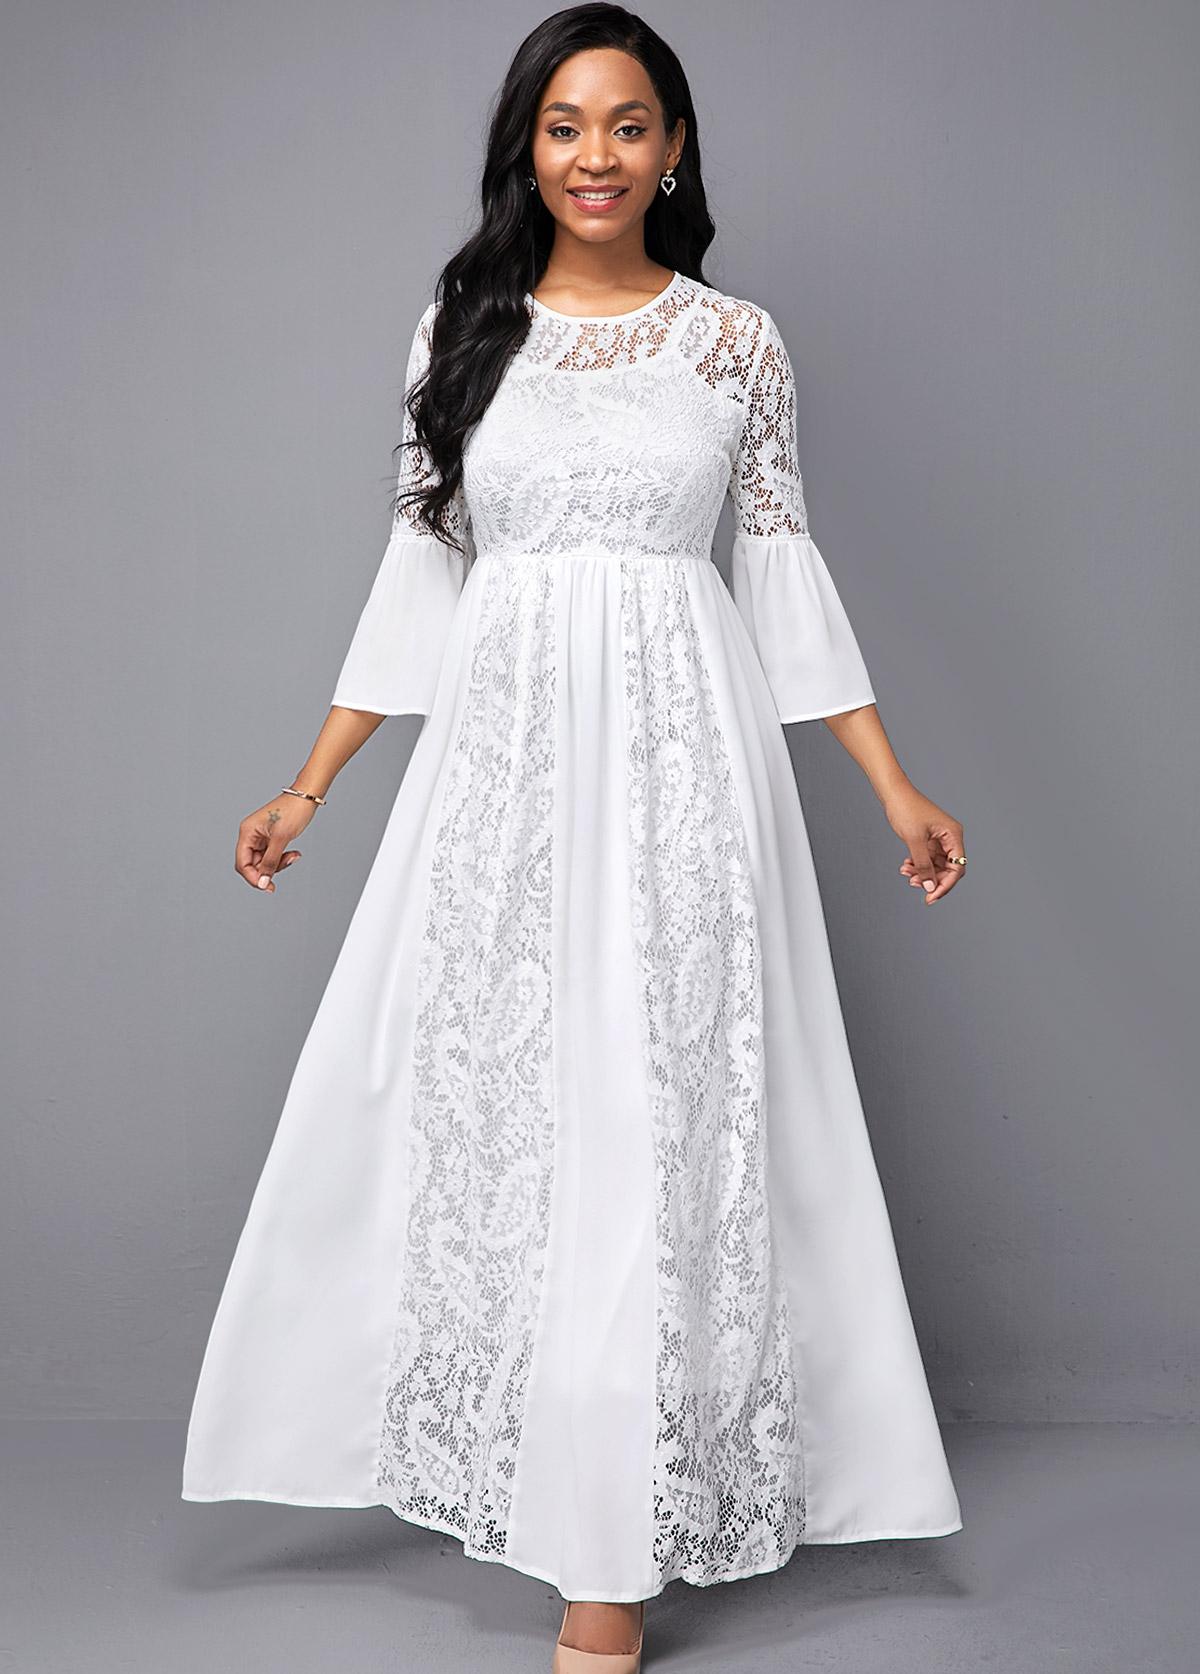 Lace Patchwork Round Neck High Waist Dress